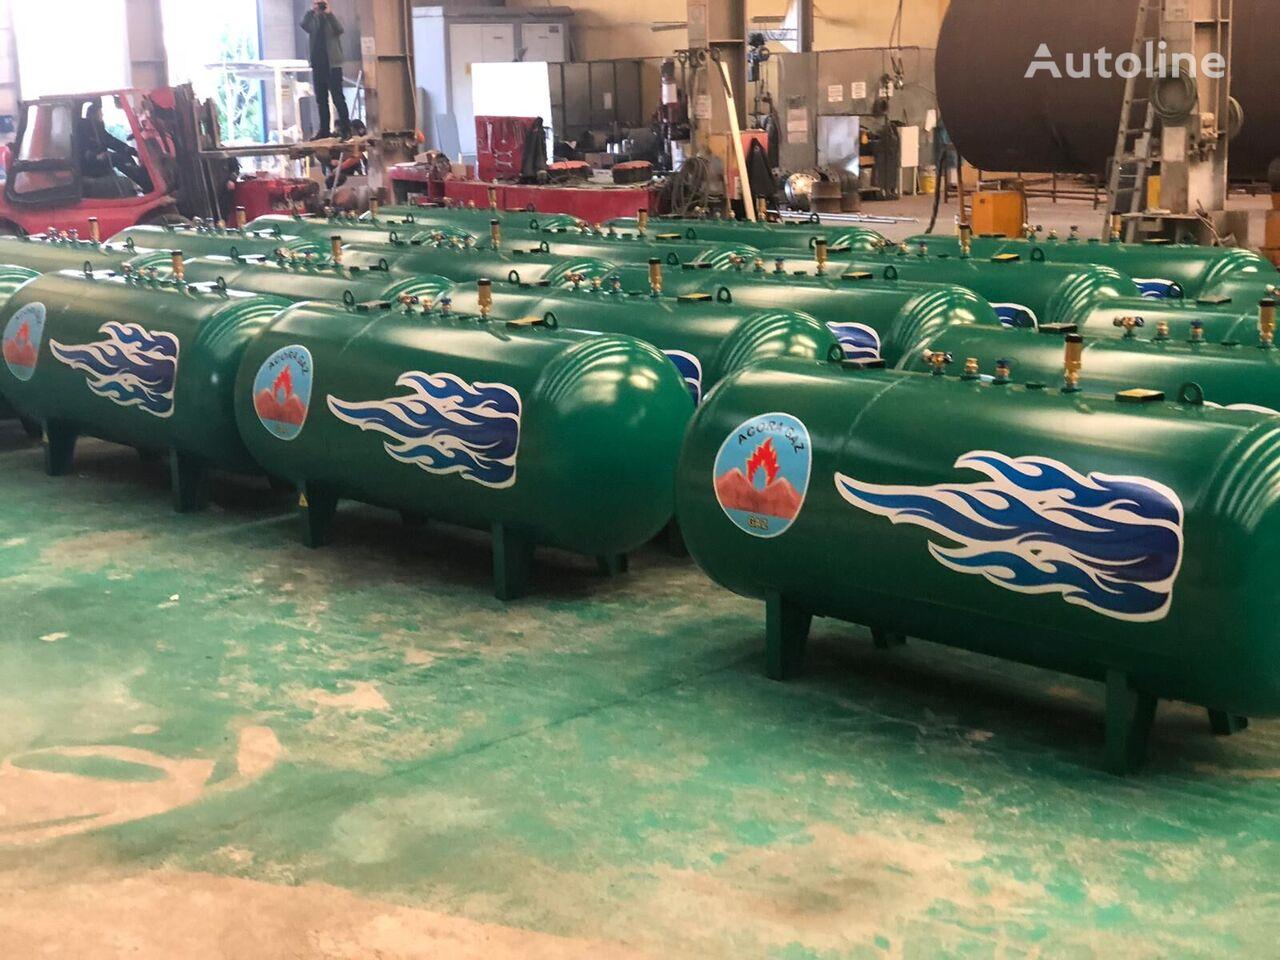 nieuw Micansan 2019 NEW 3 TO 5M3 DOMESTIC TANK gastank